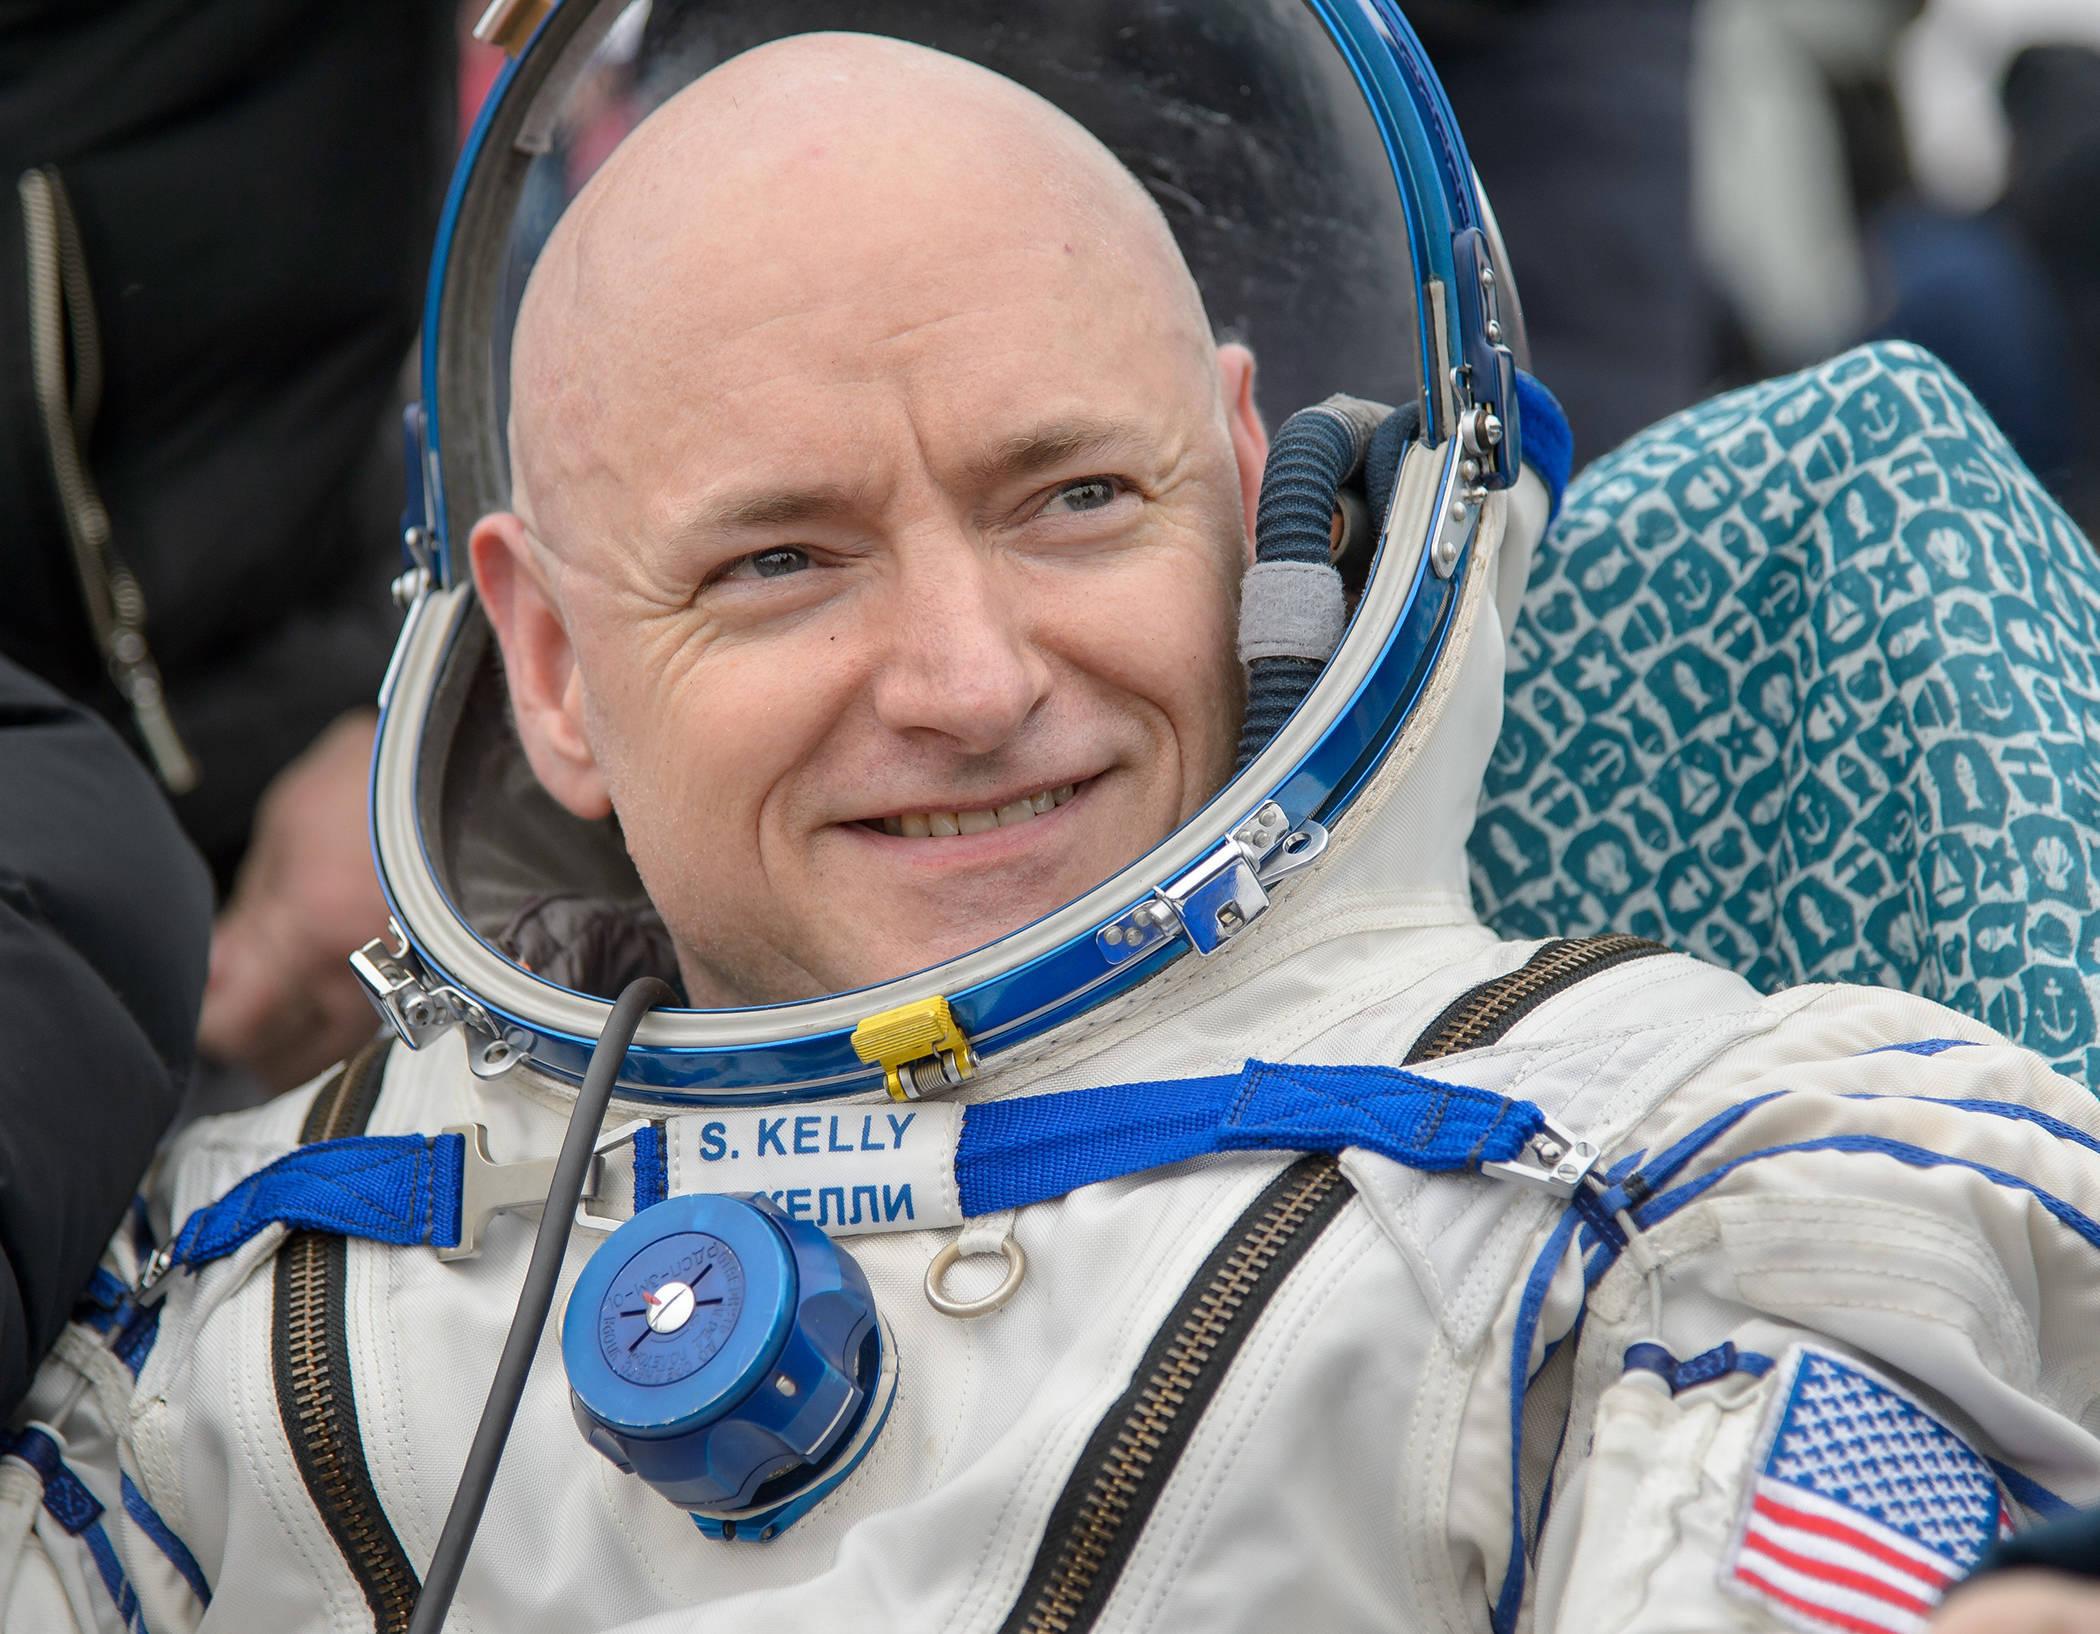 dc270747b4caa81e4cda_HIGH_RES_Scott_Kelly_author_photo_CREDIT_NASA.Bill_Ingalls.jpg